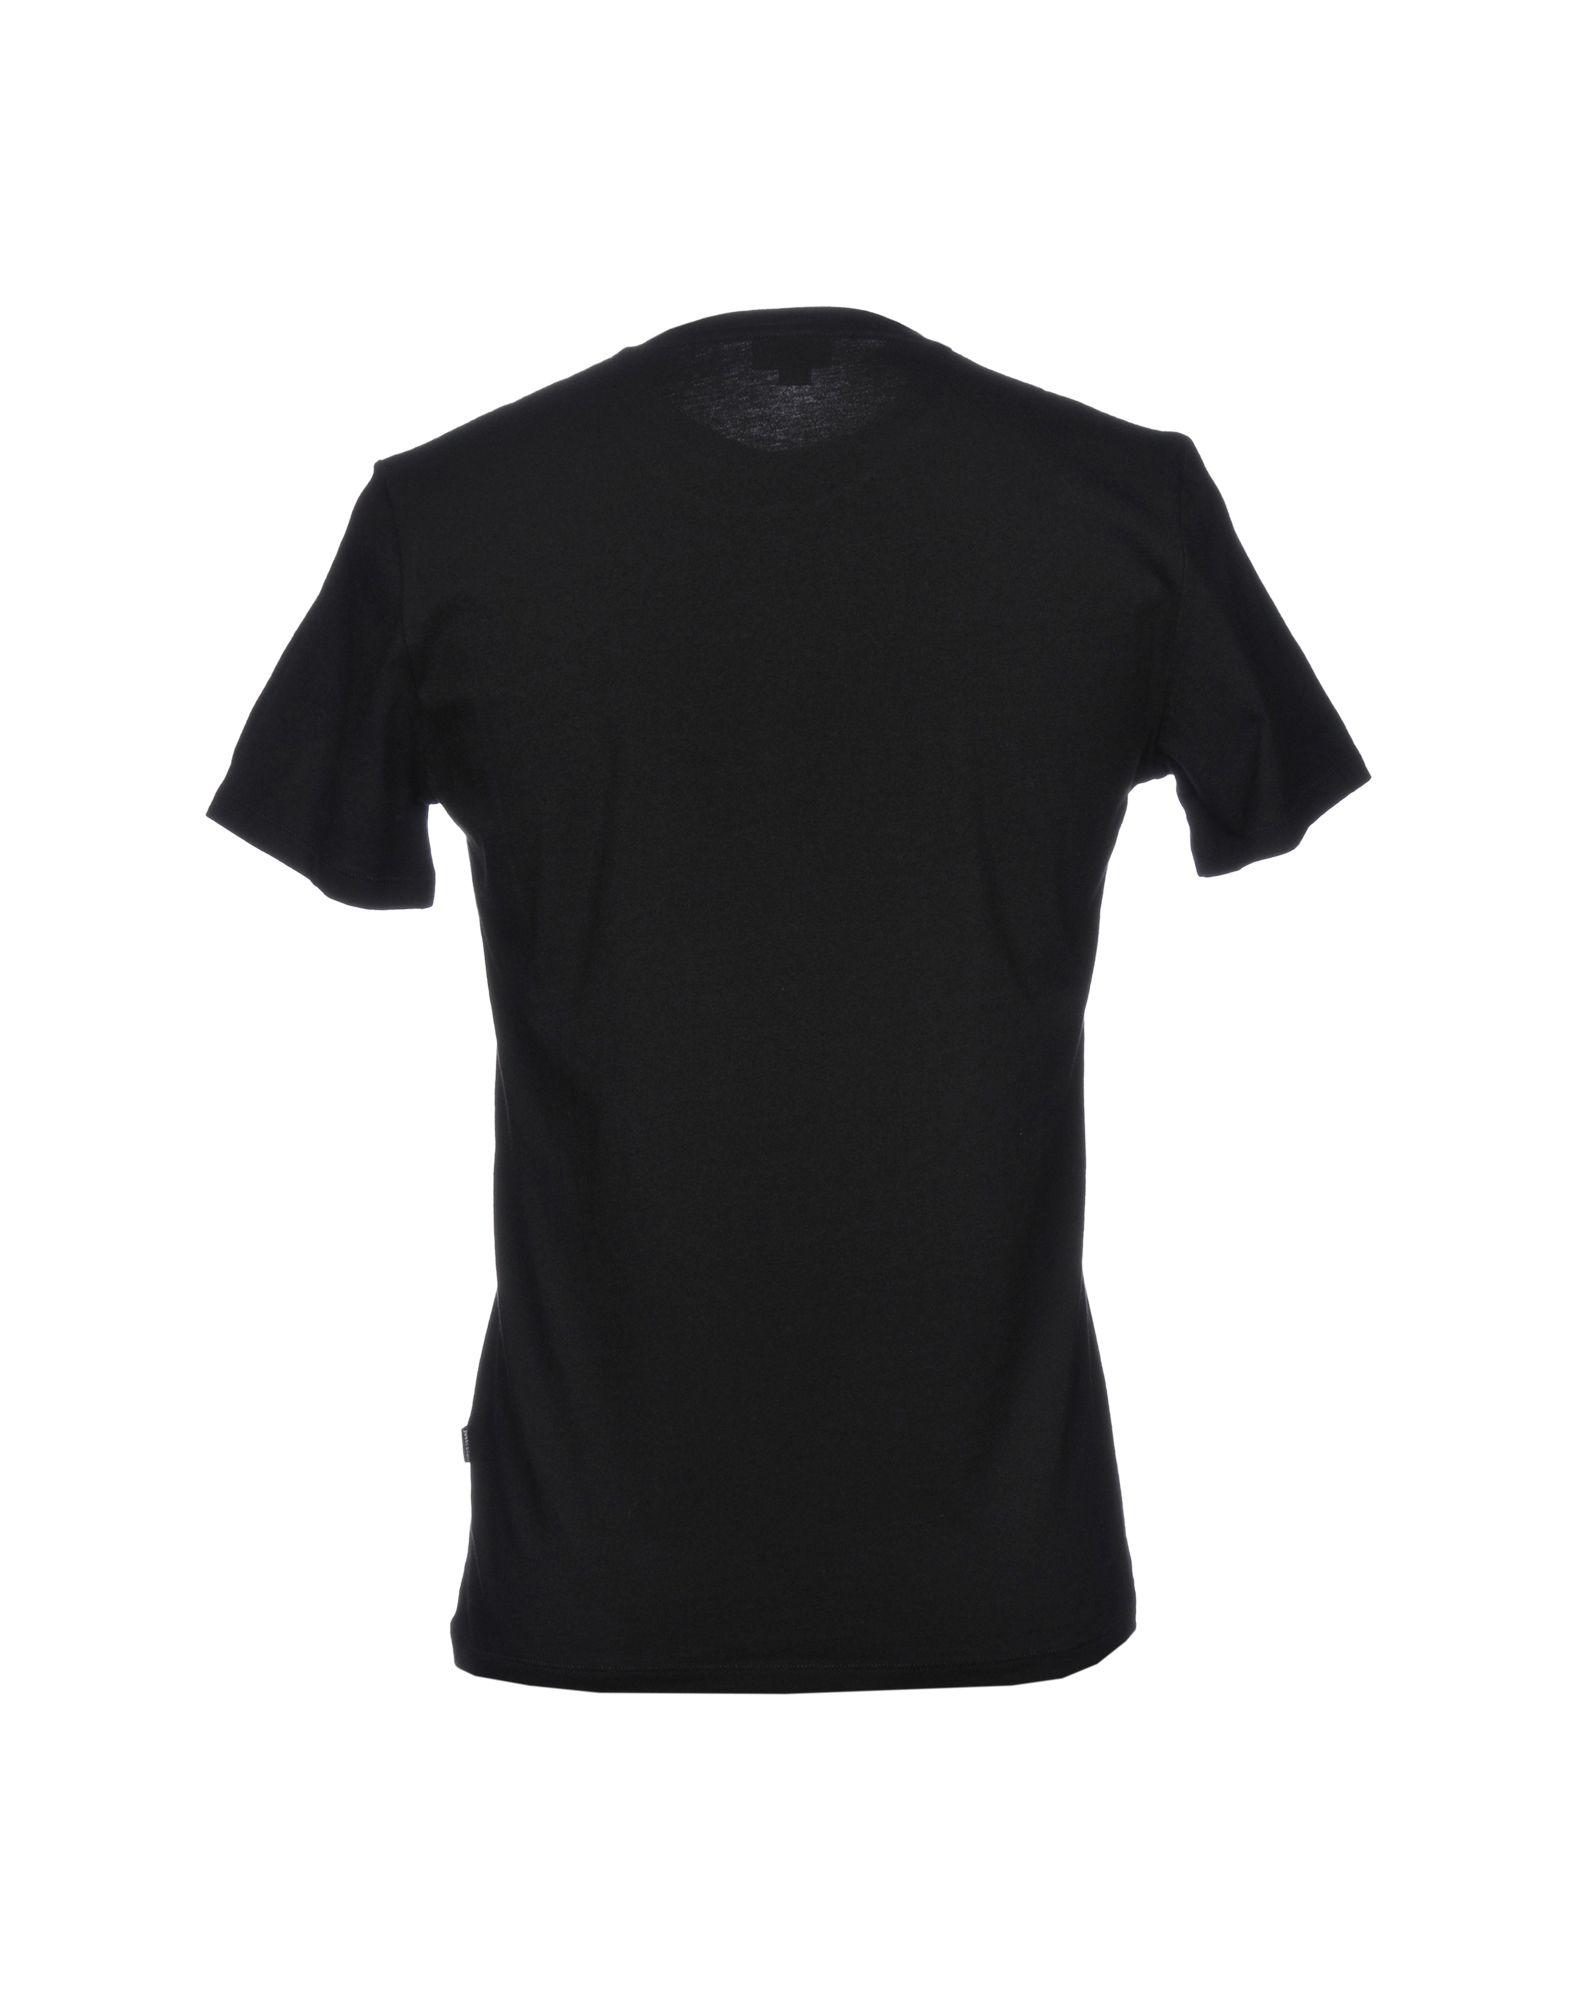 T-Shirt Just Just T-Shirt Cavalli Uomo - 12176248DQ b7ae88